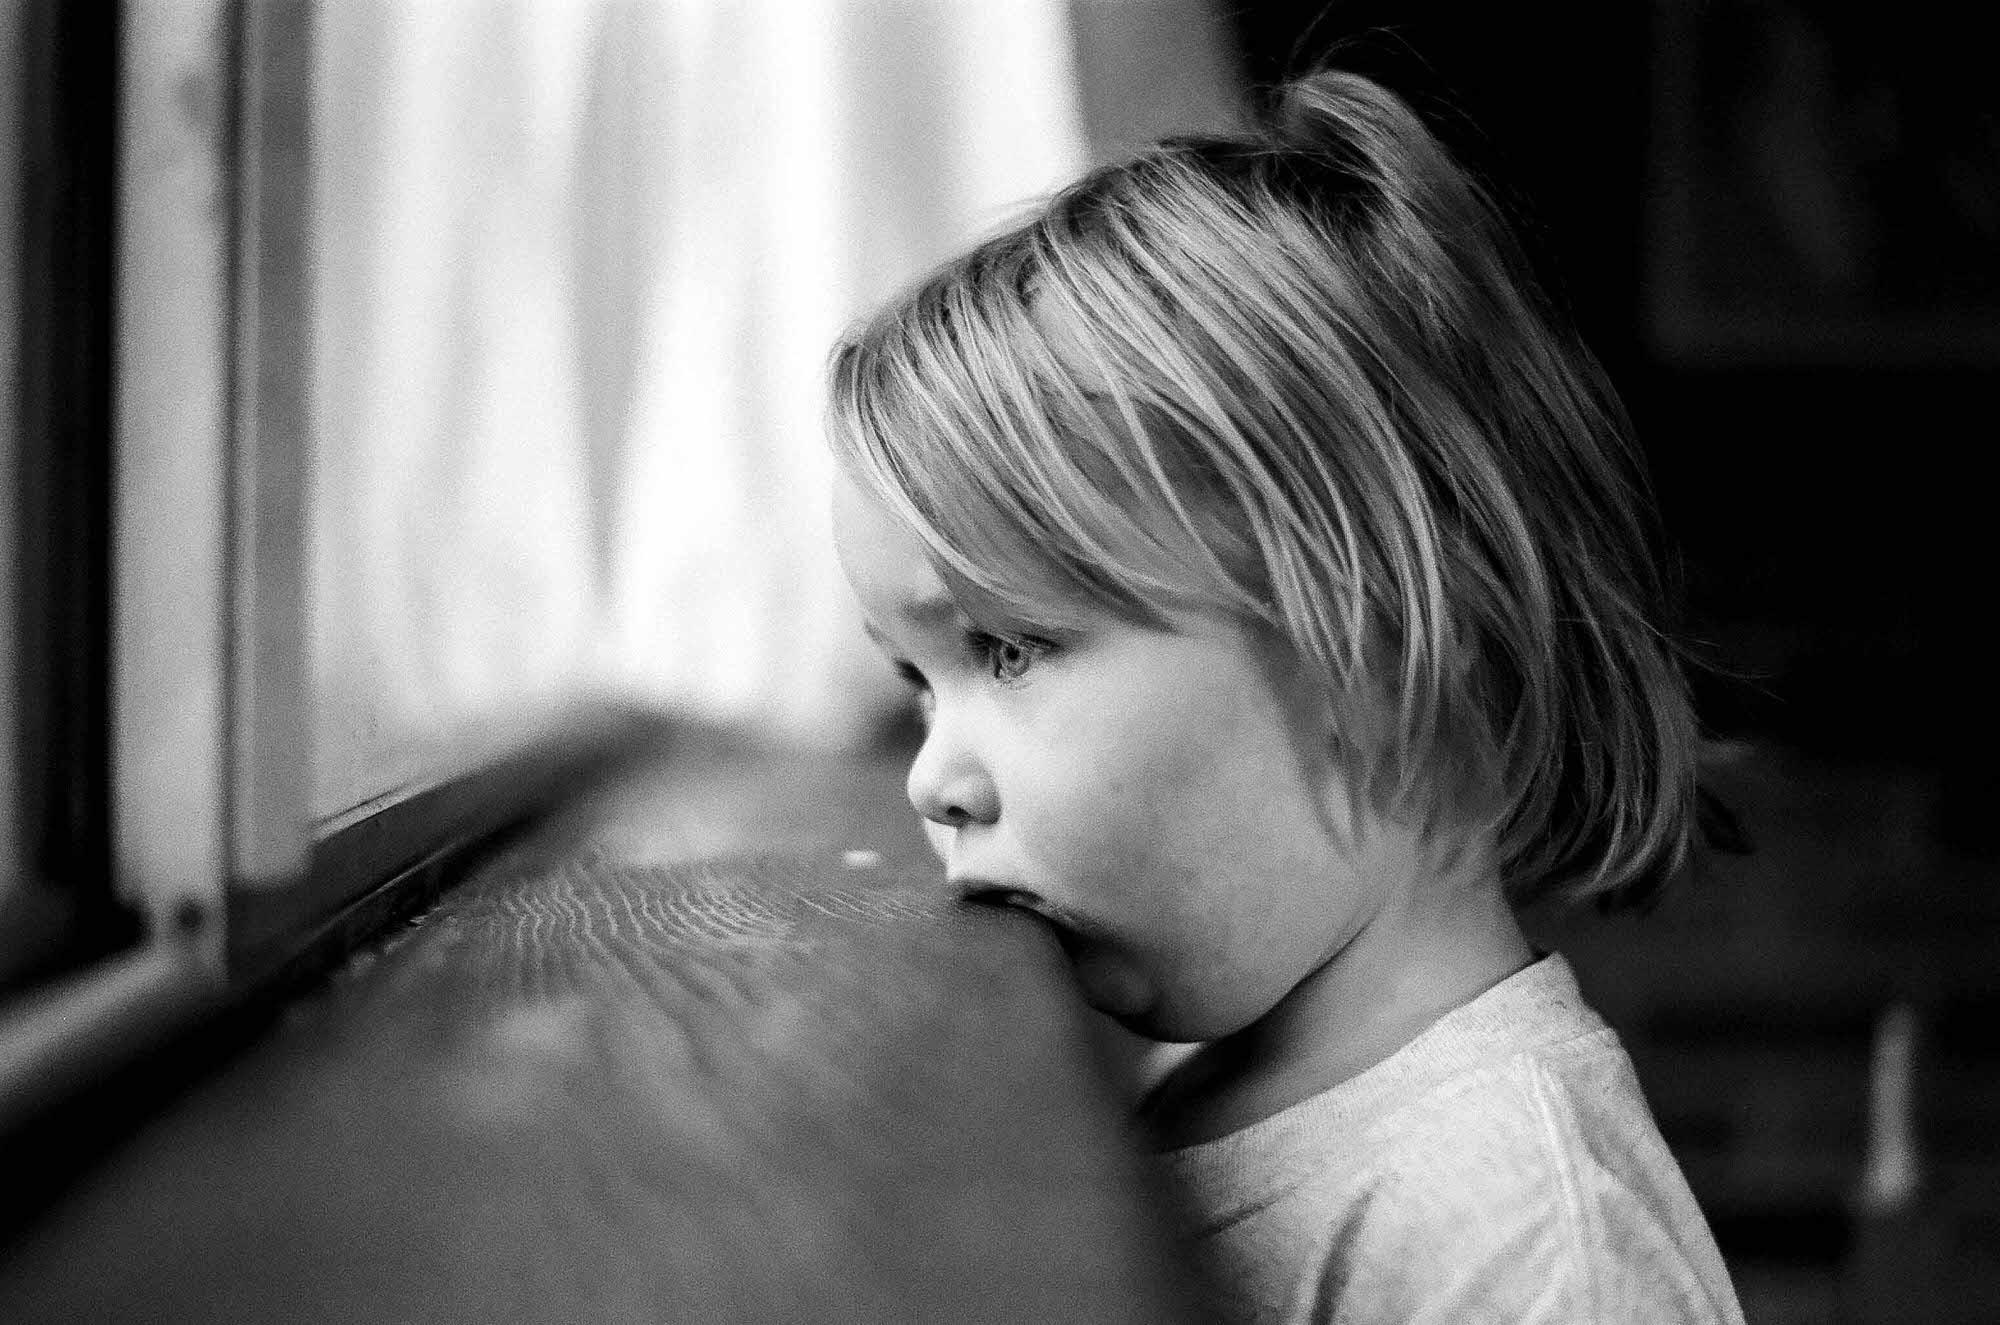 brandon-lovejoy-nikon-f5-35mm-film-camera-film-objektiv-100-words-12.jpg